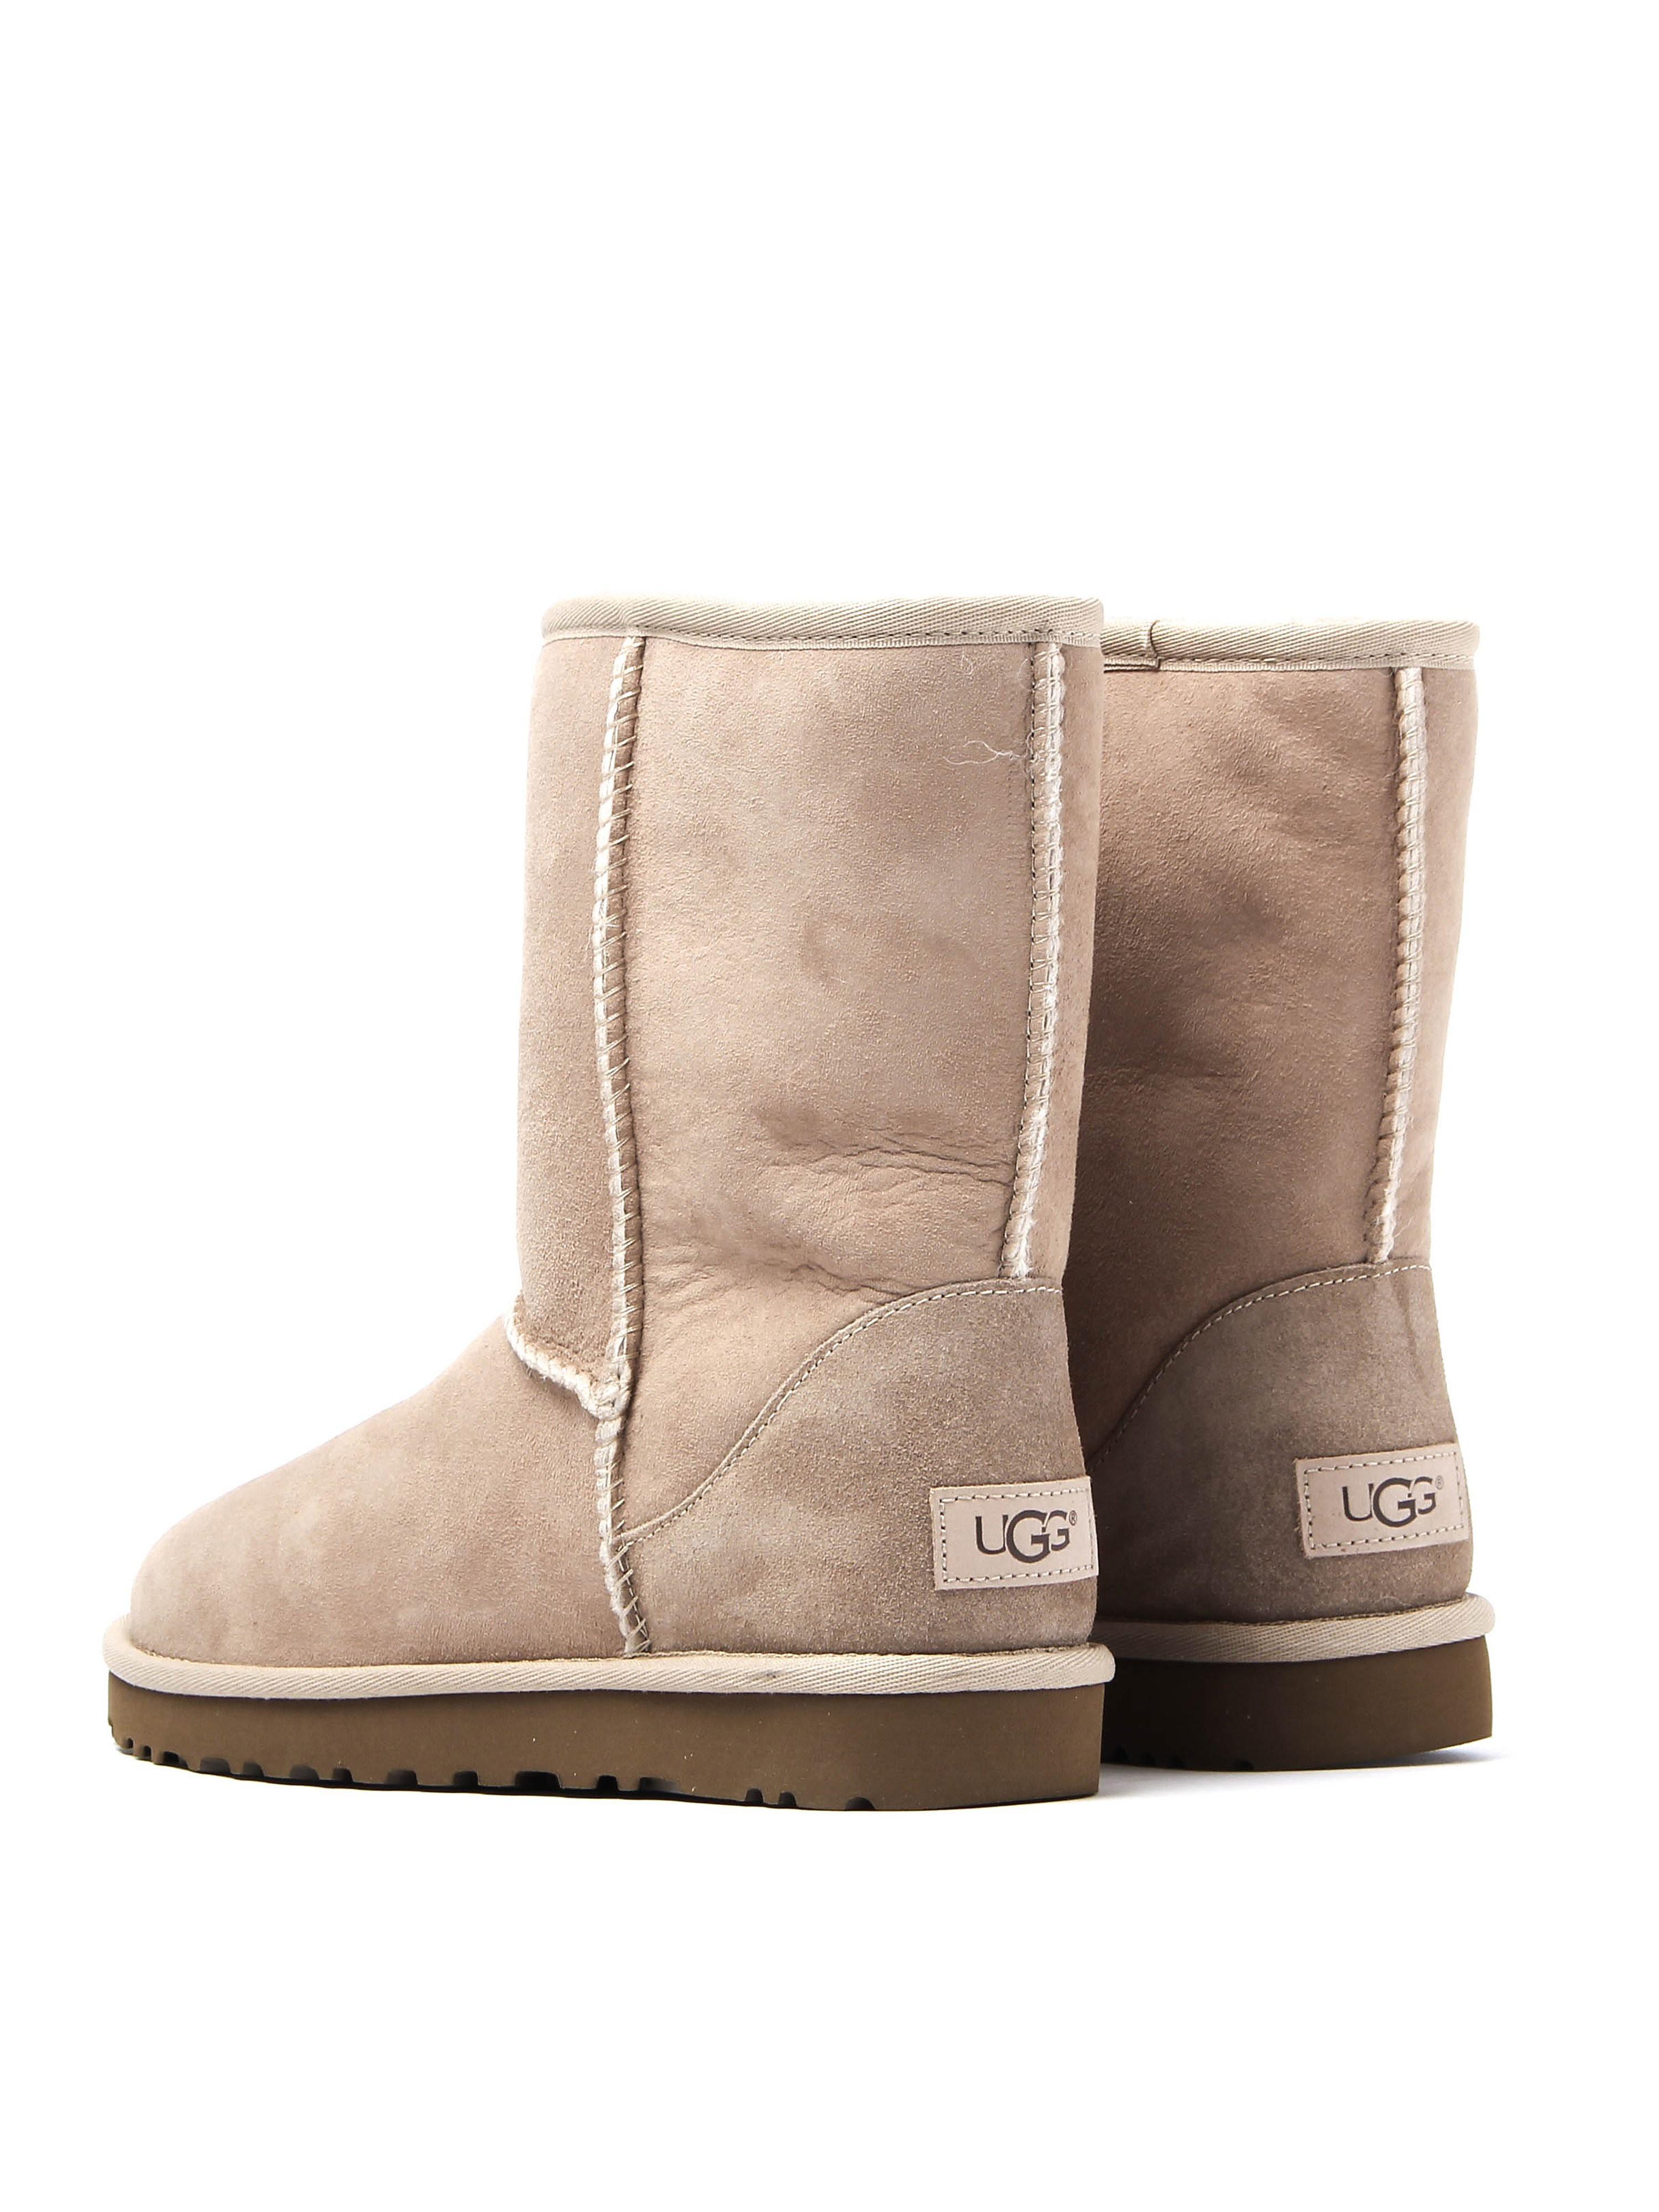 UGG Women's Classic Short II Sheepskin Boots - Sand